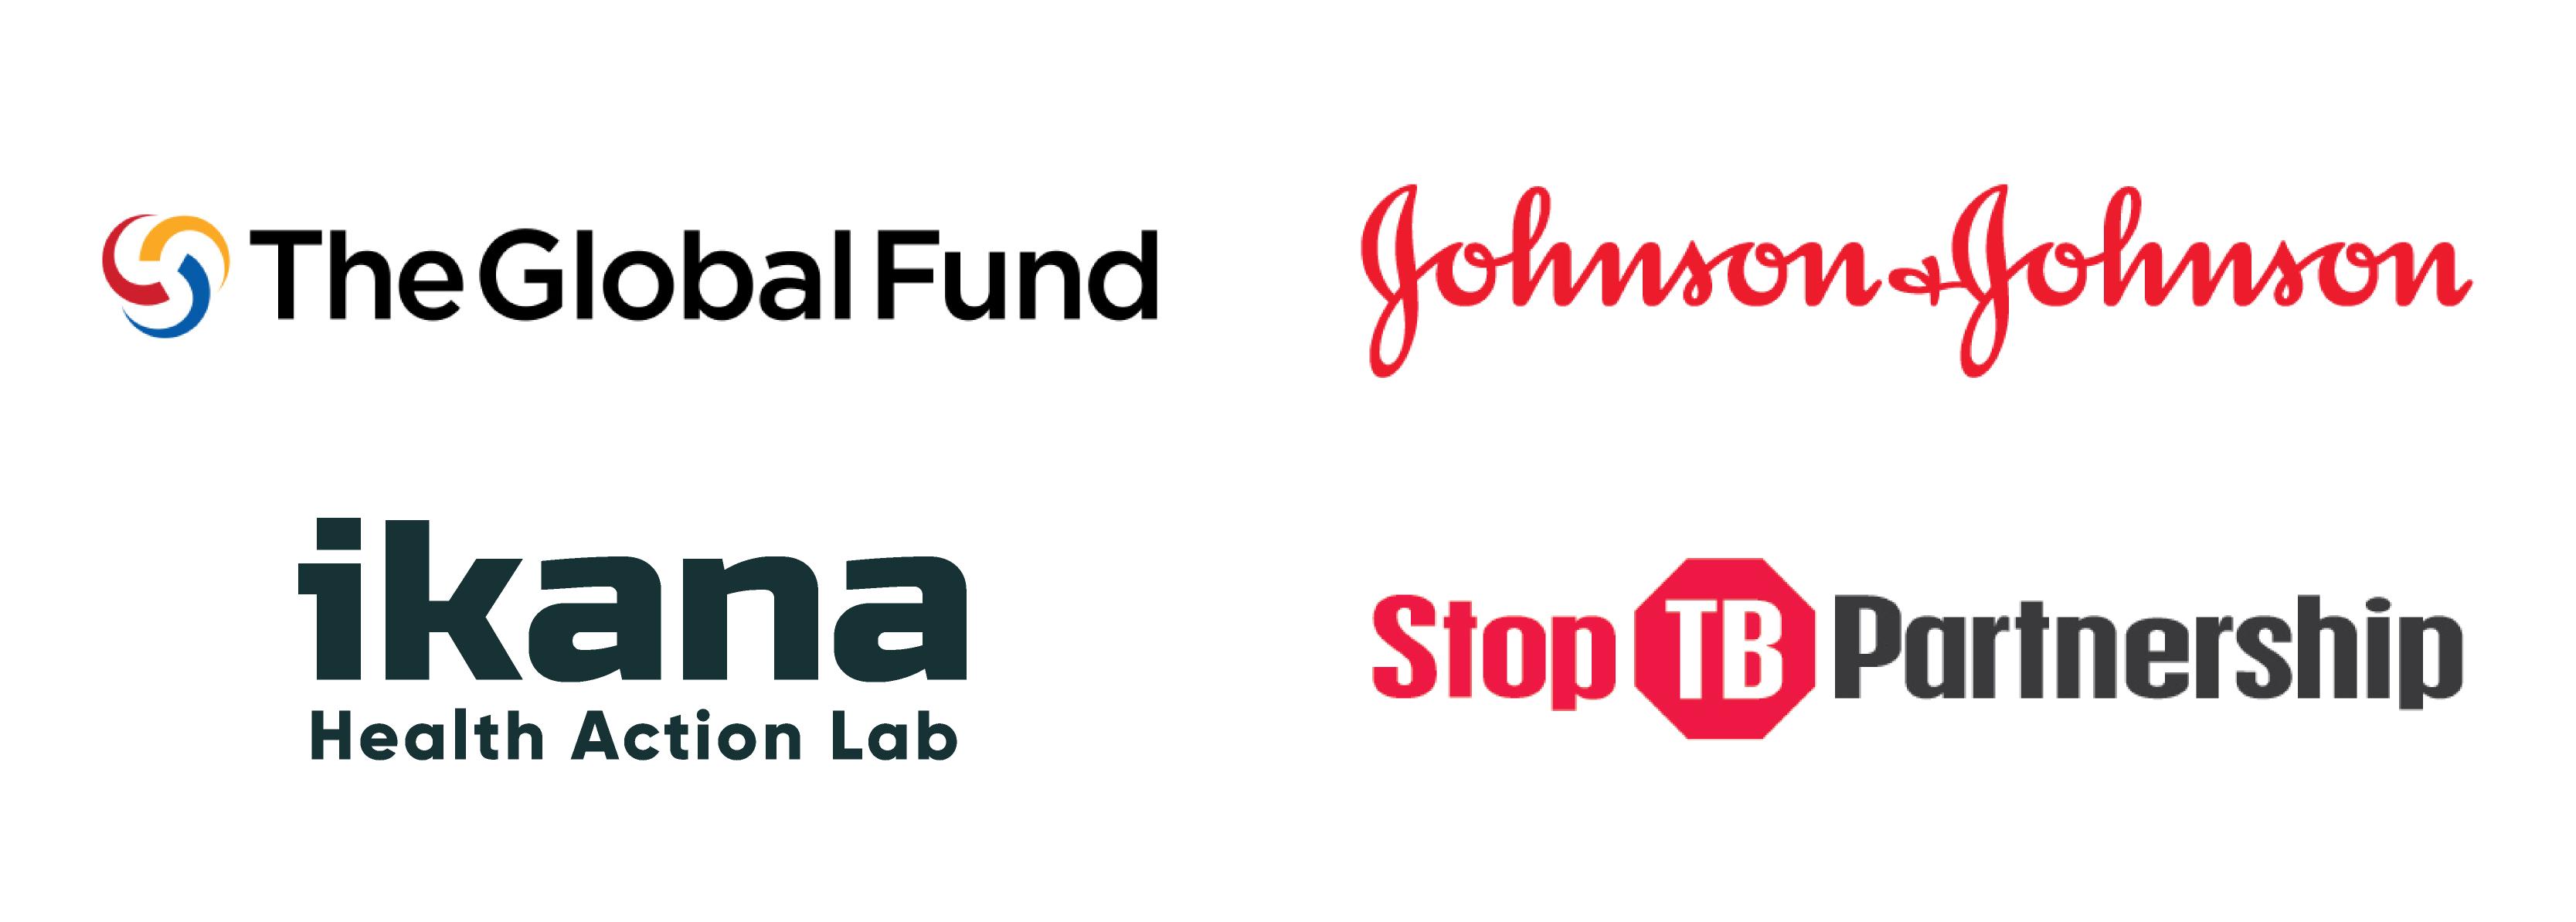 Logos: Johnson & Johnson, The Global Fund, Stop TB Partnership, Ikana Health Action Lab